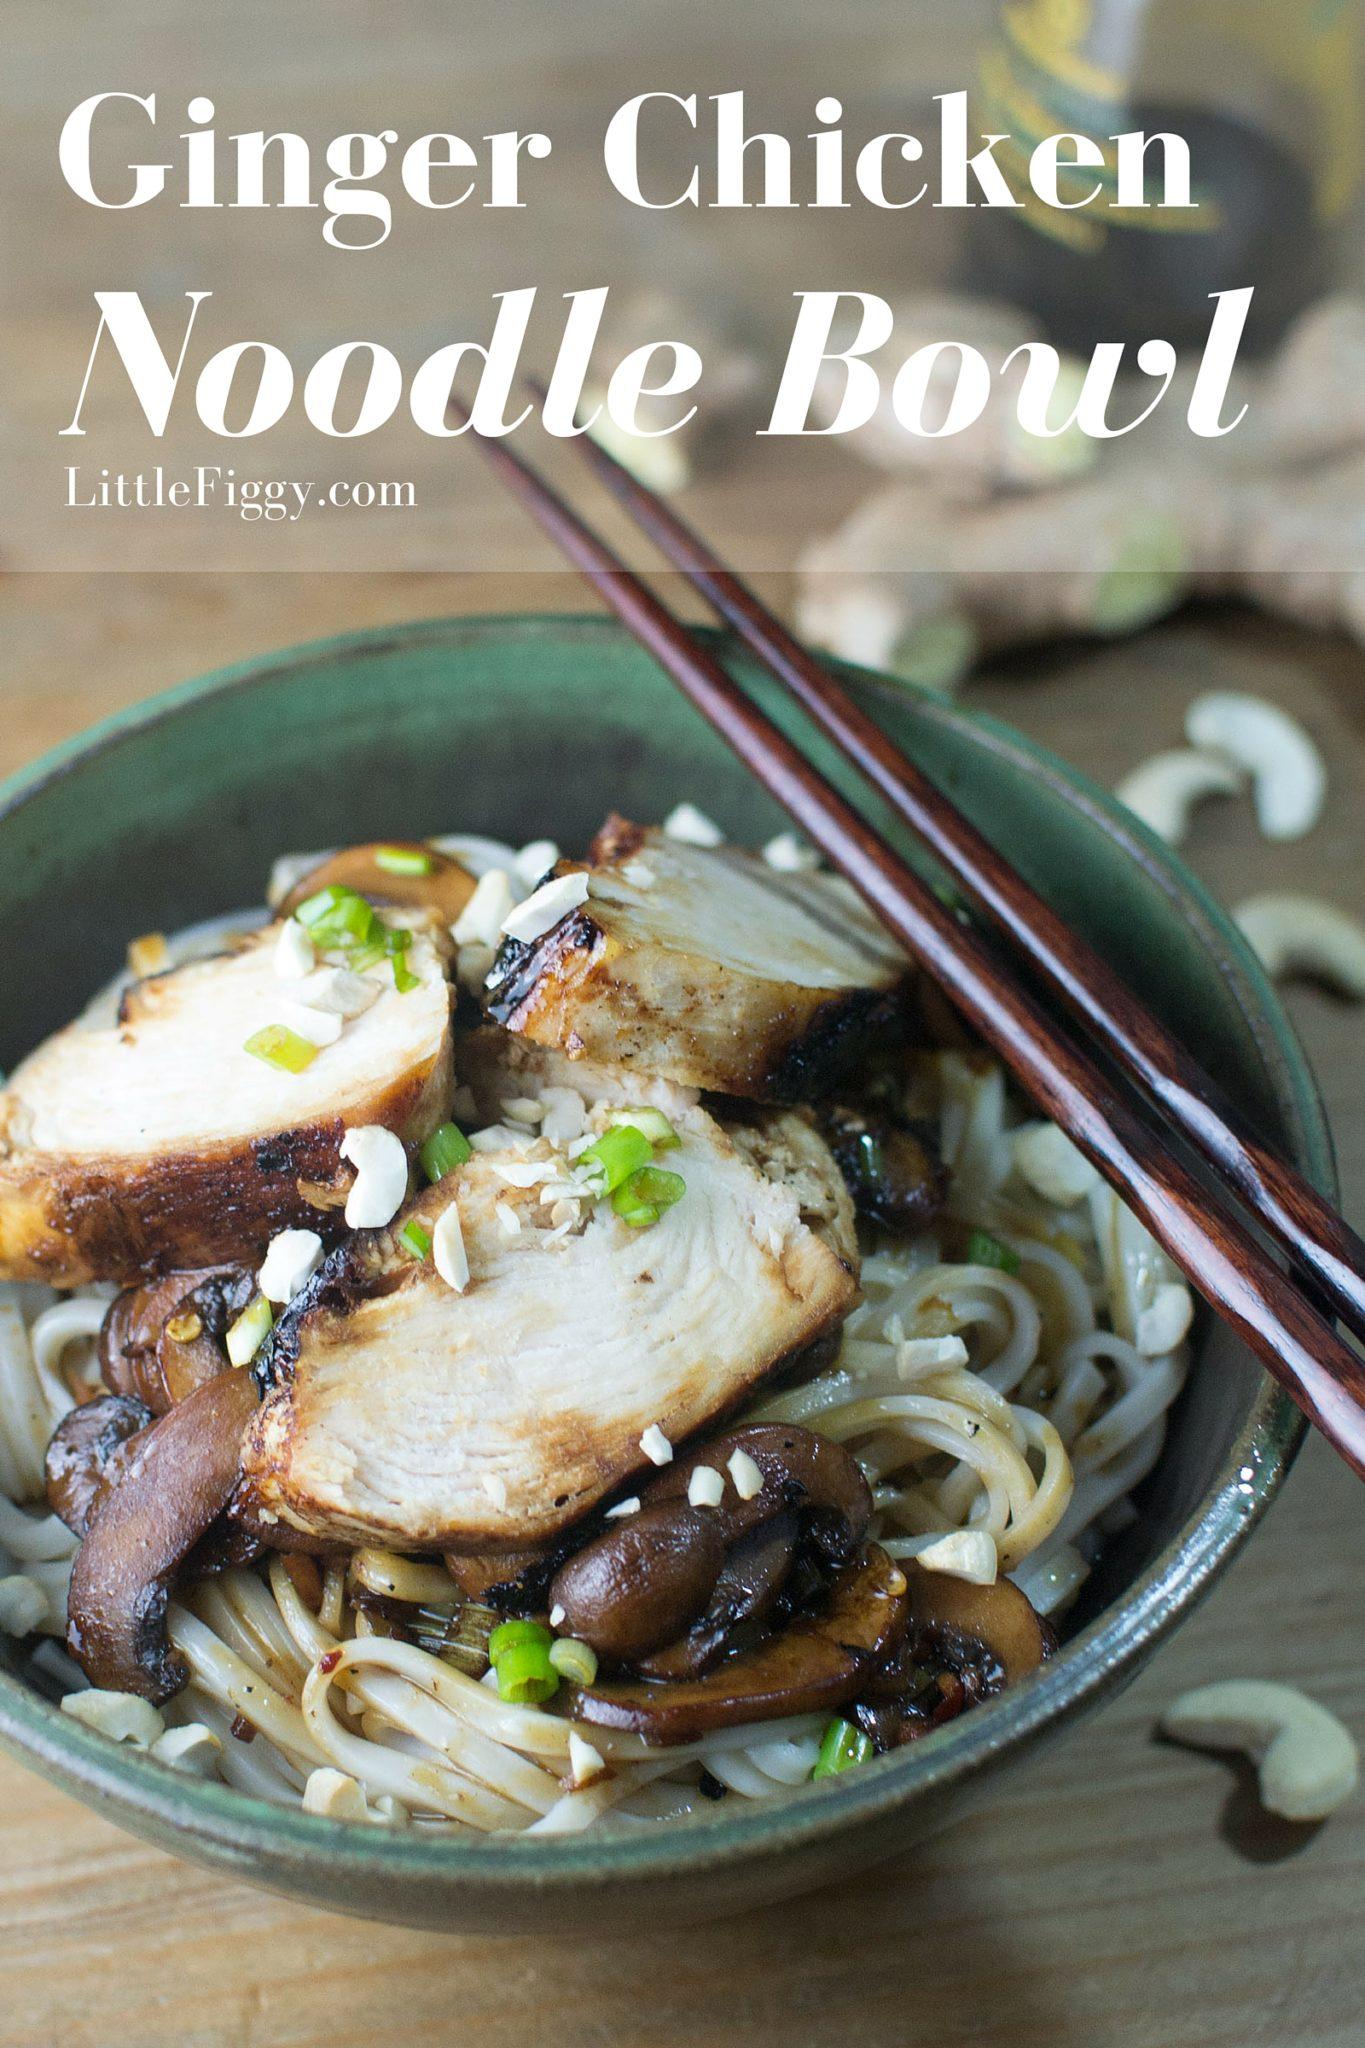 Ginger Chicken Noodle Bowl - #HealthyFoods - @LittleFiggyFood